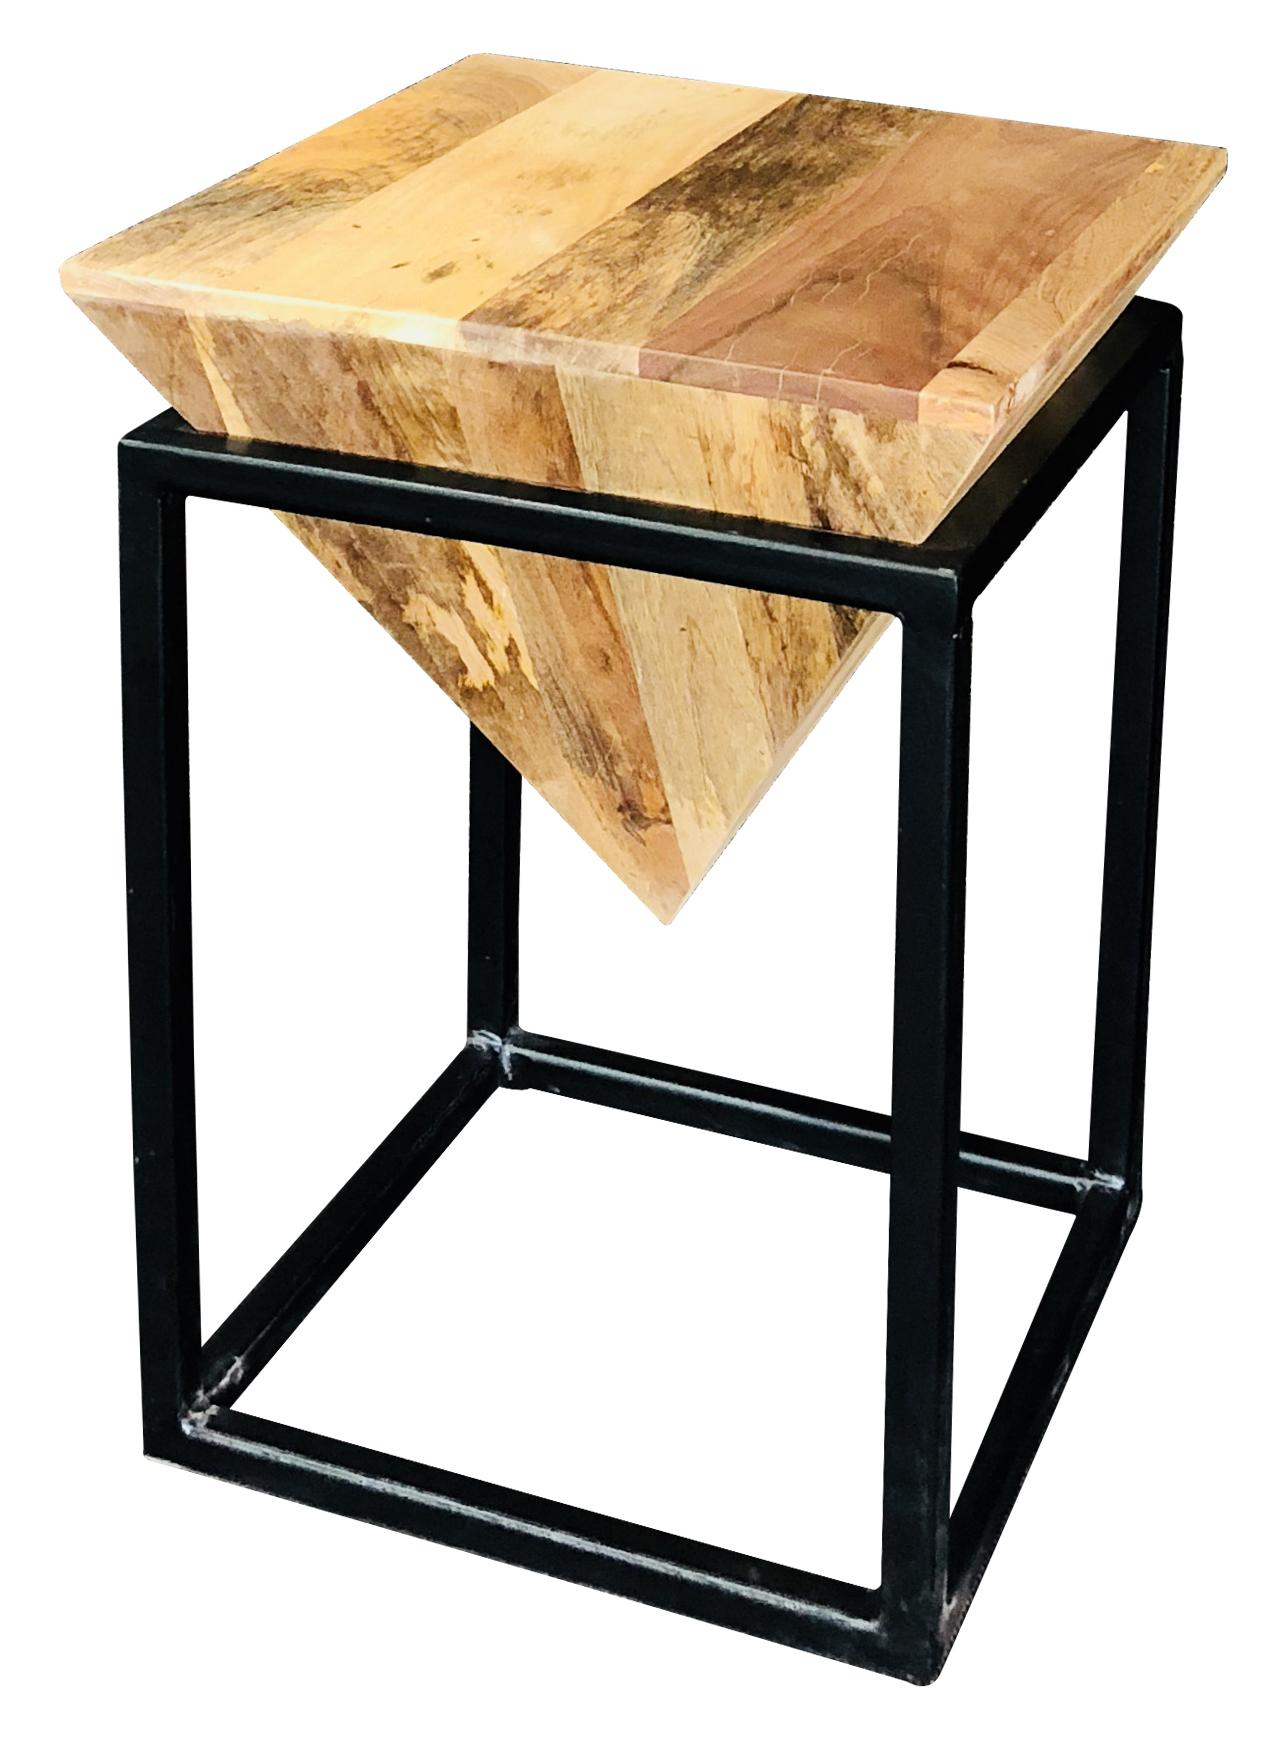 Surprising Small Industrial Style Geometric Light Mango Wood Stool Machost Co Dining Chair Design Ideas Machostcouk